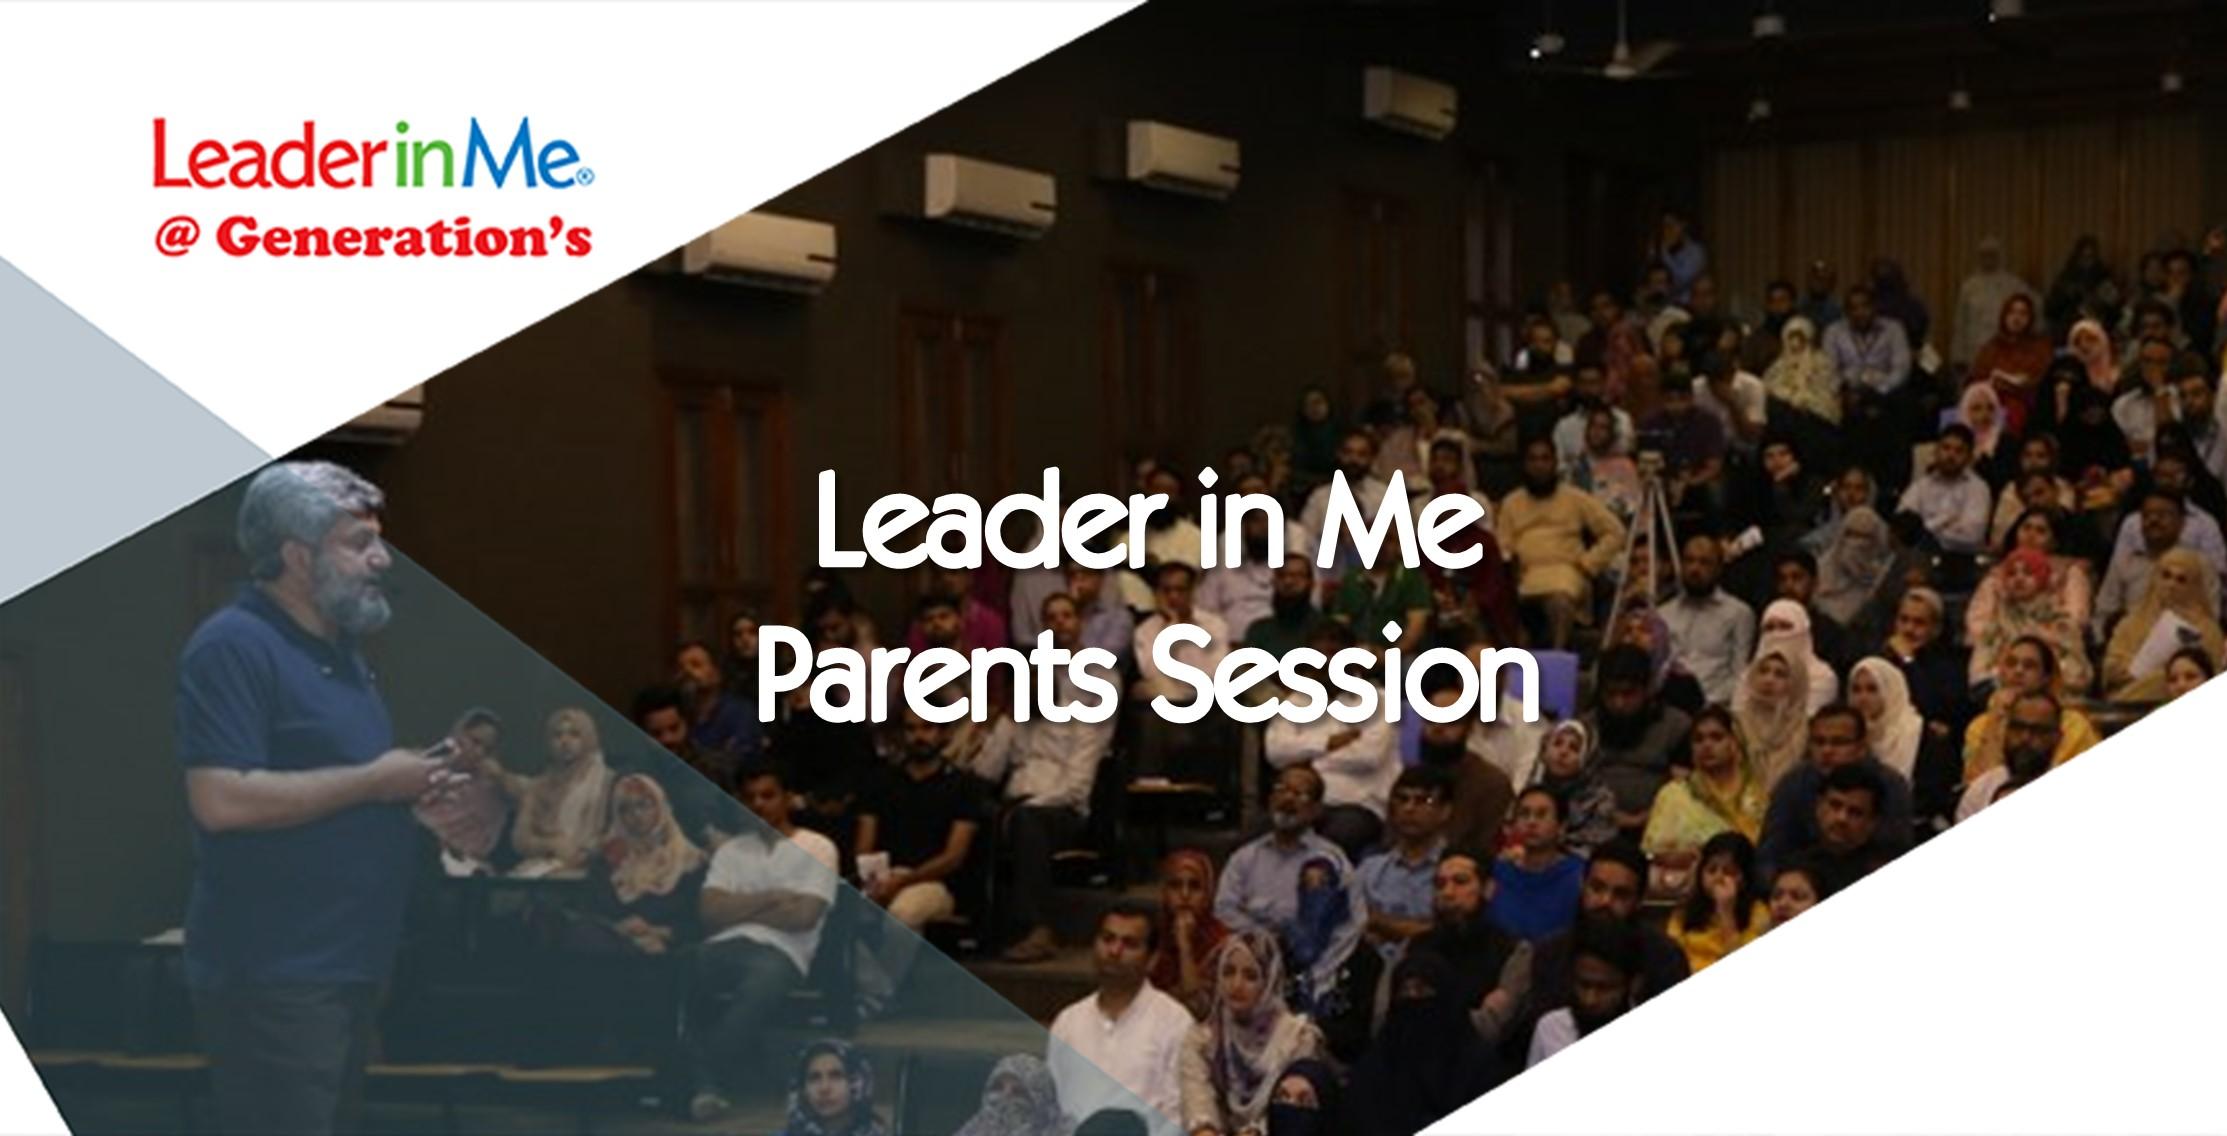 Leader in me Parents session